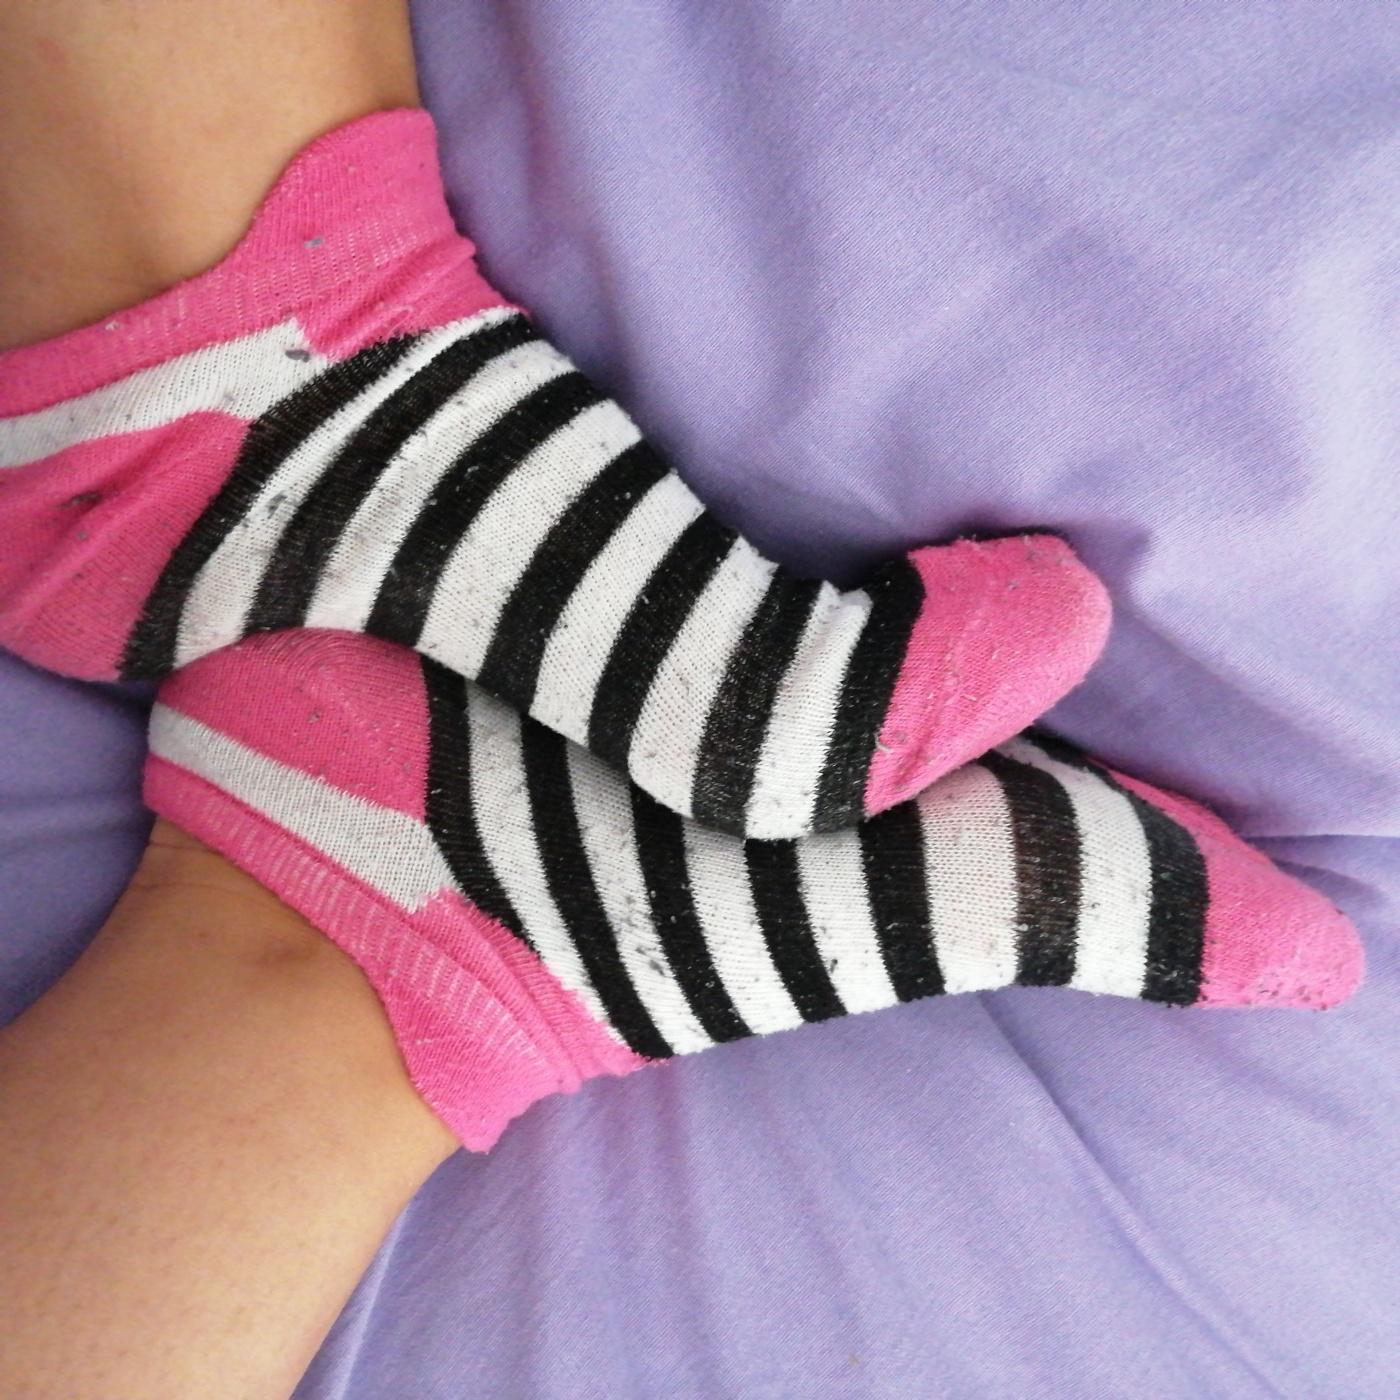 Mis calcetines usados